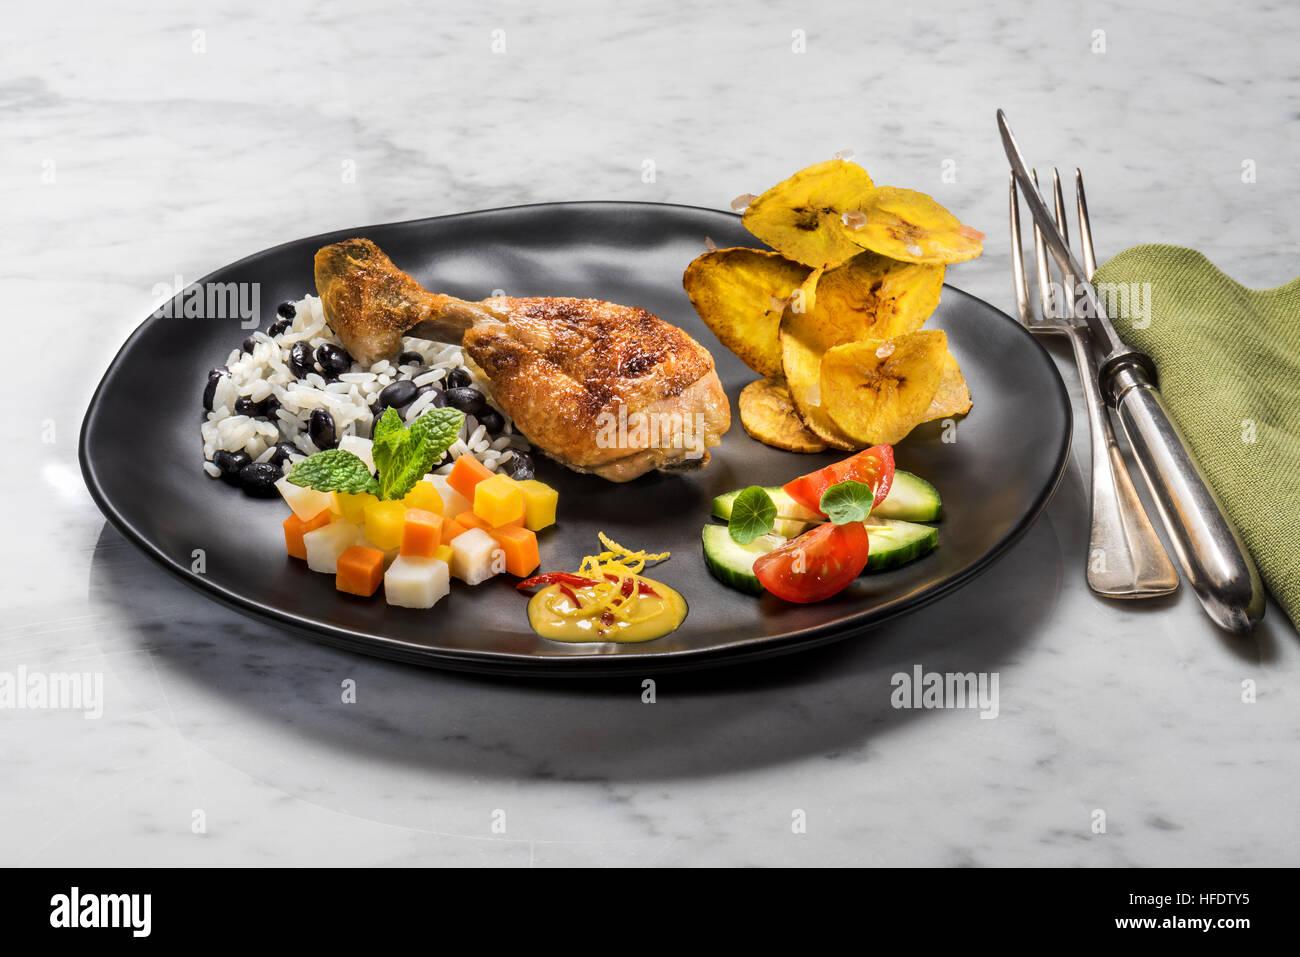 Típica comida cubana, pollo, arroz con frijoles negros, plátanos fritos, patatas fritas, y ensalada de verduras. Foto de stock